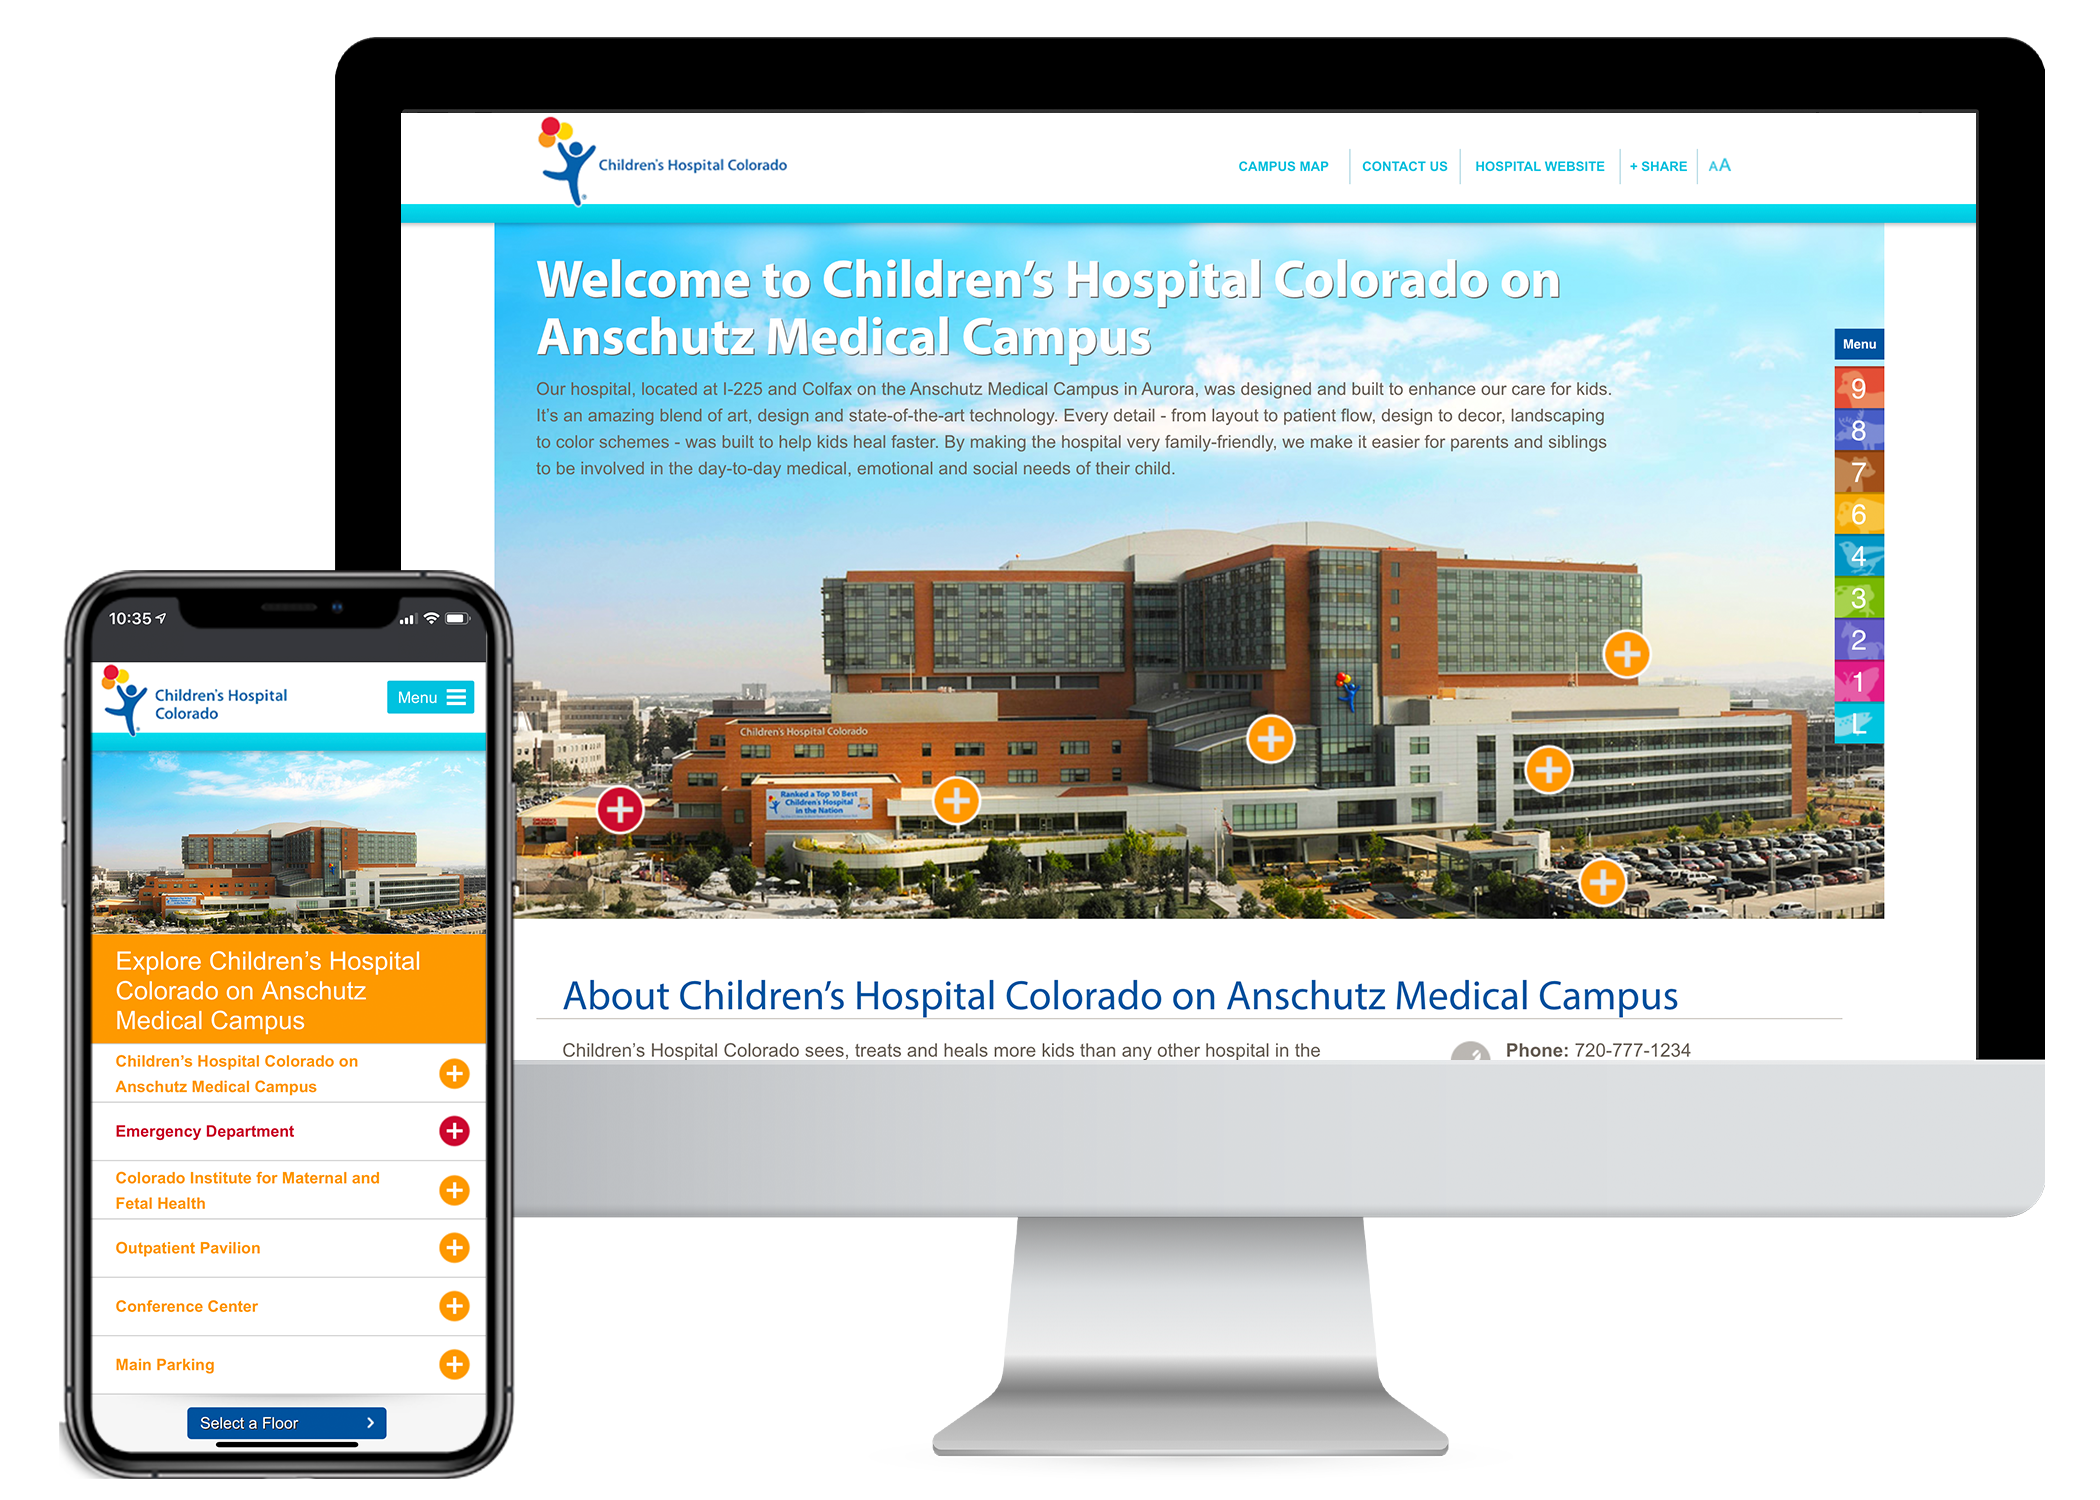 I-ology Work Samples - Children's Hospital Colorado